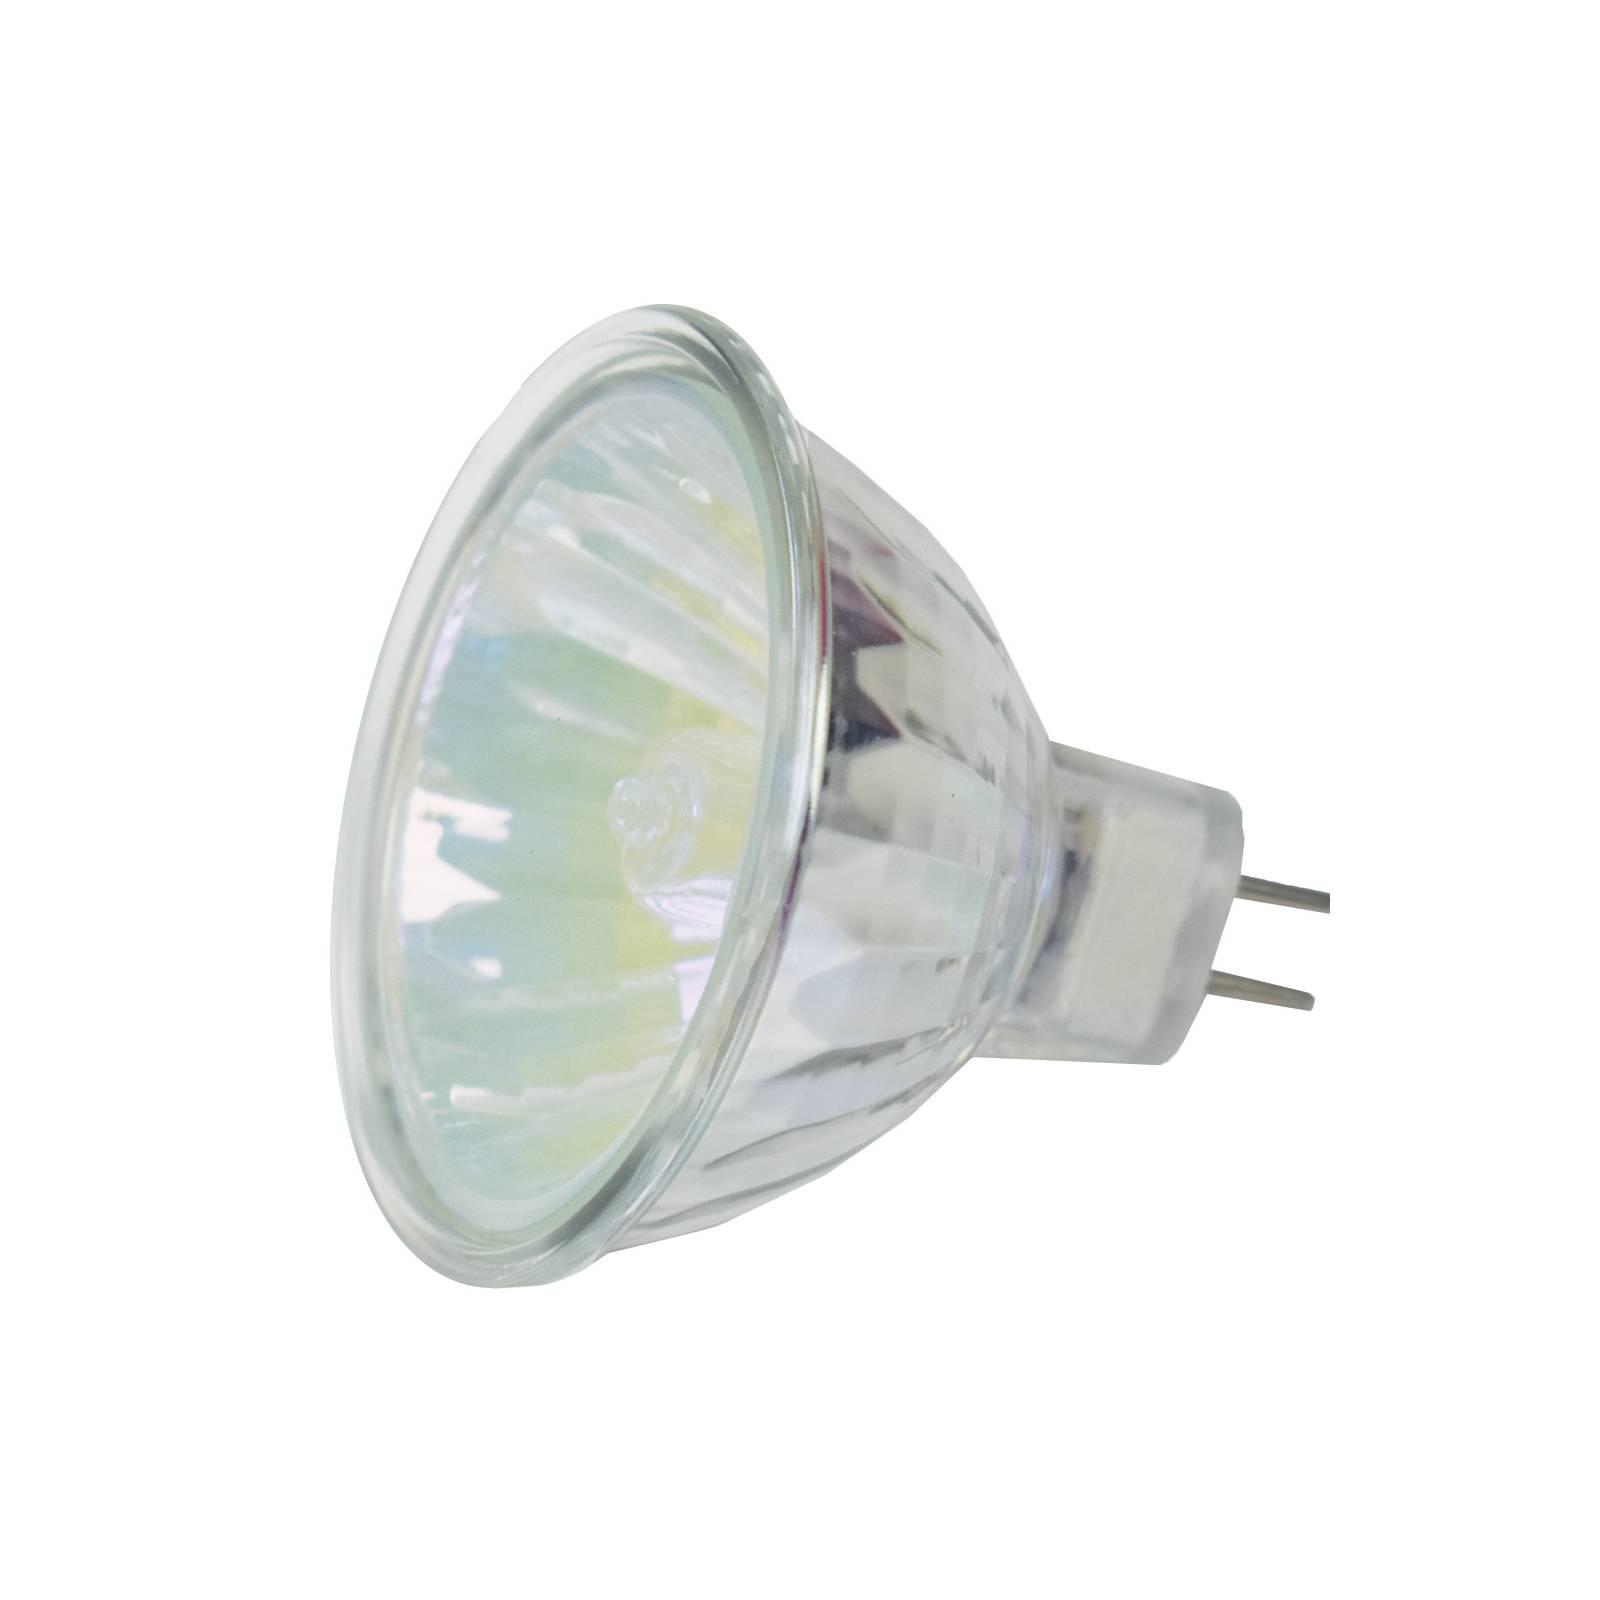 Biorb 10 watt halogen light bulb ship ebay picture 2 of 2 arubaitofo Image collections